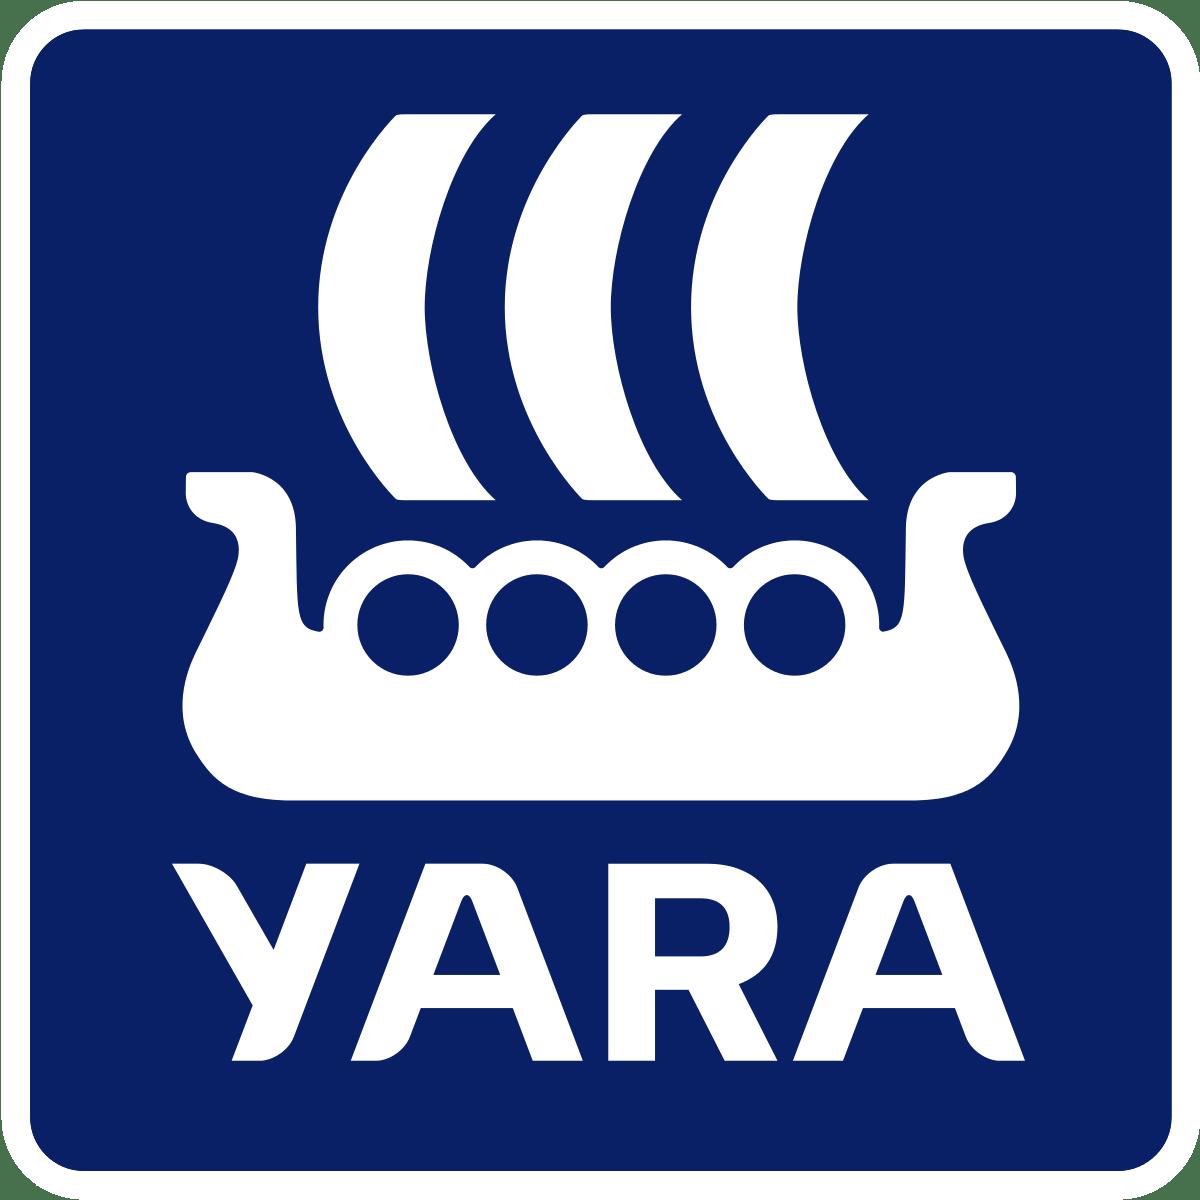 Maintenance Specialist At YARA Tanzania, June 2020